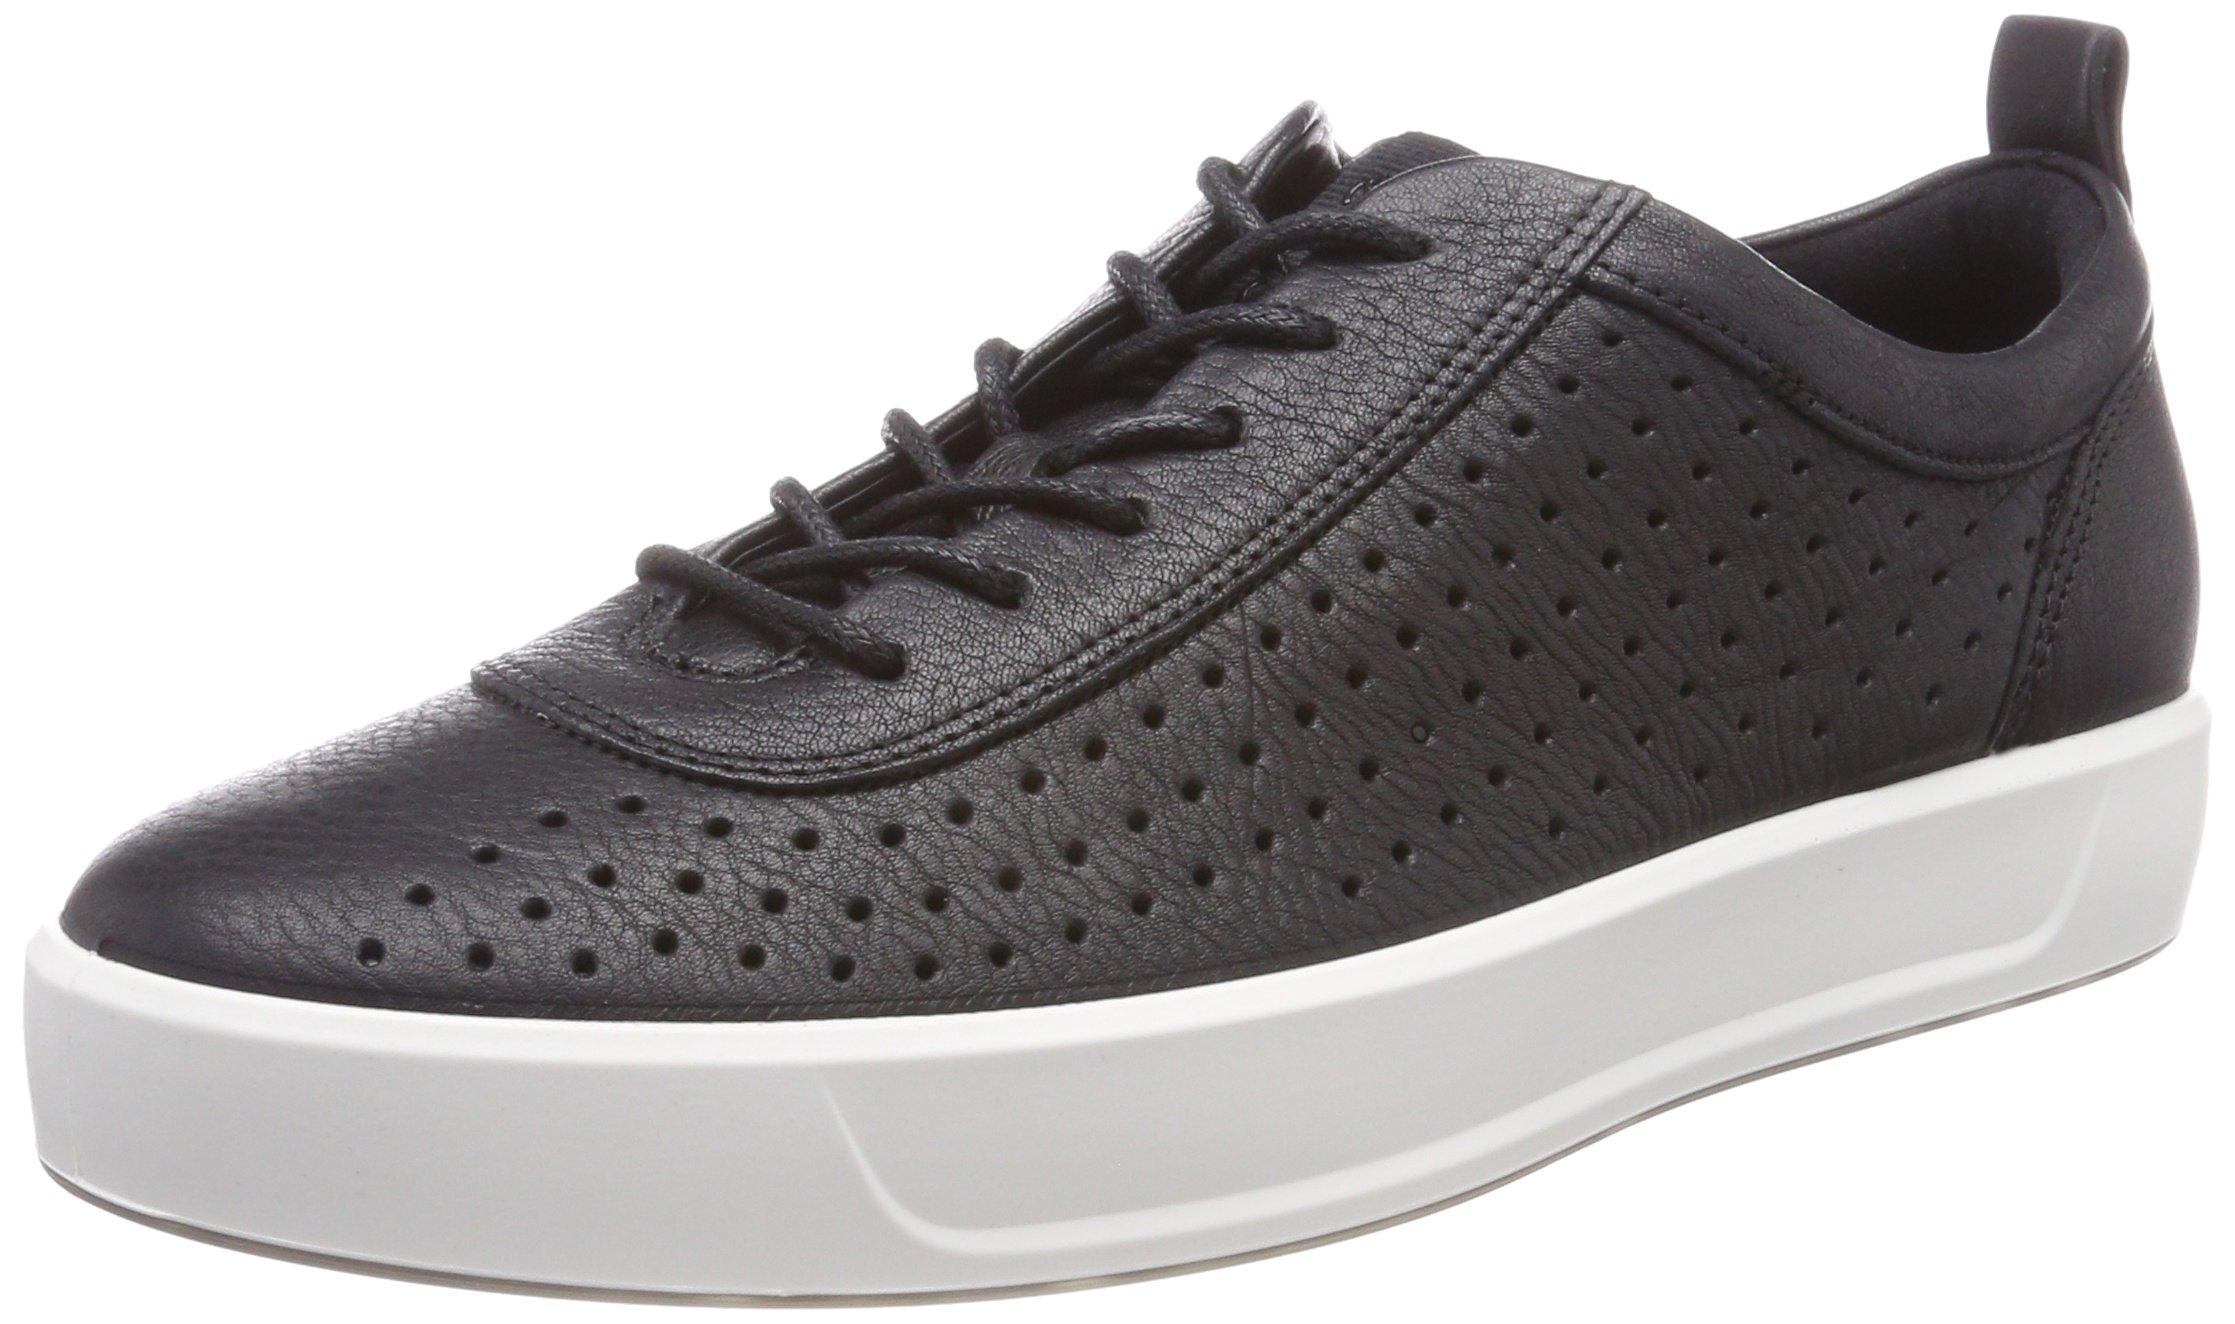 8Sneakers Ecco Soft Basses Eu HommeNoirblack46 YfgymIb76v